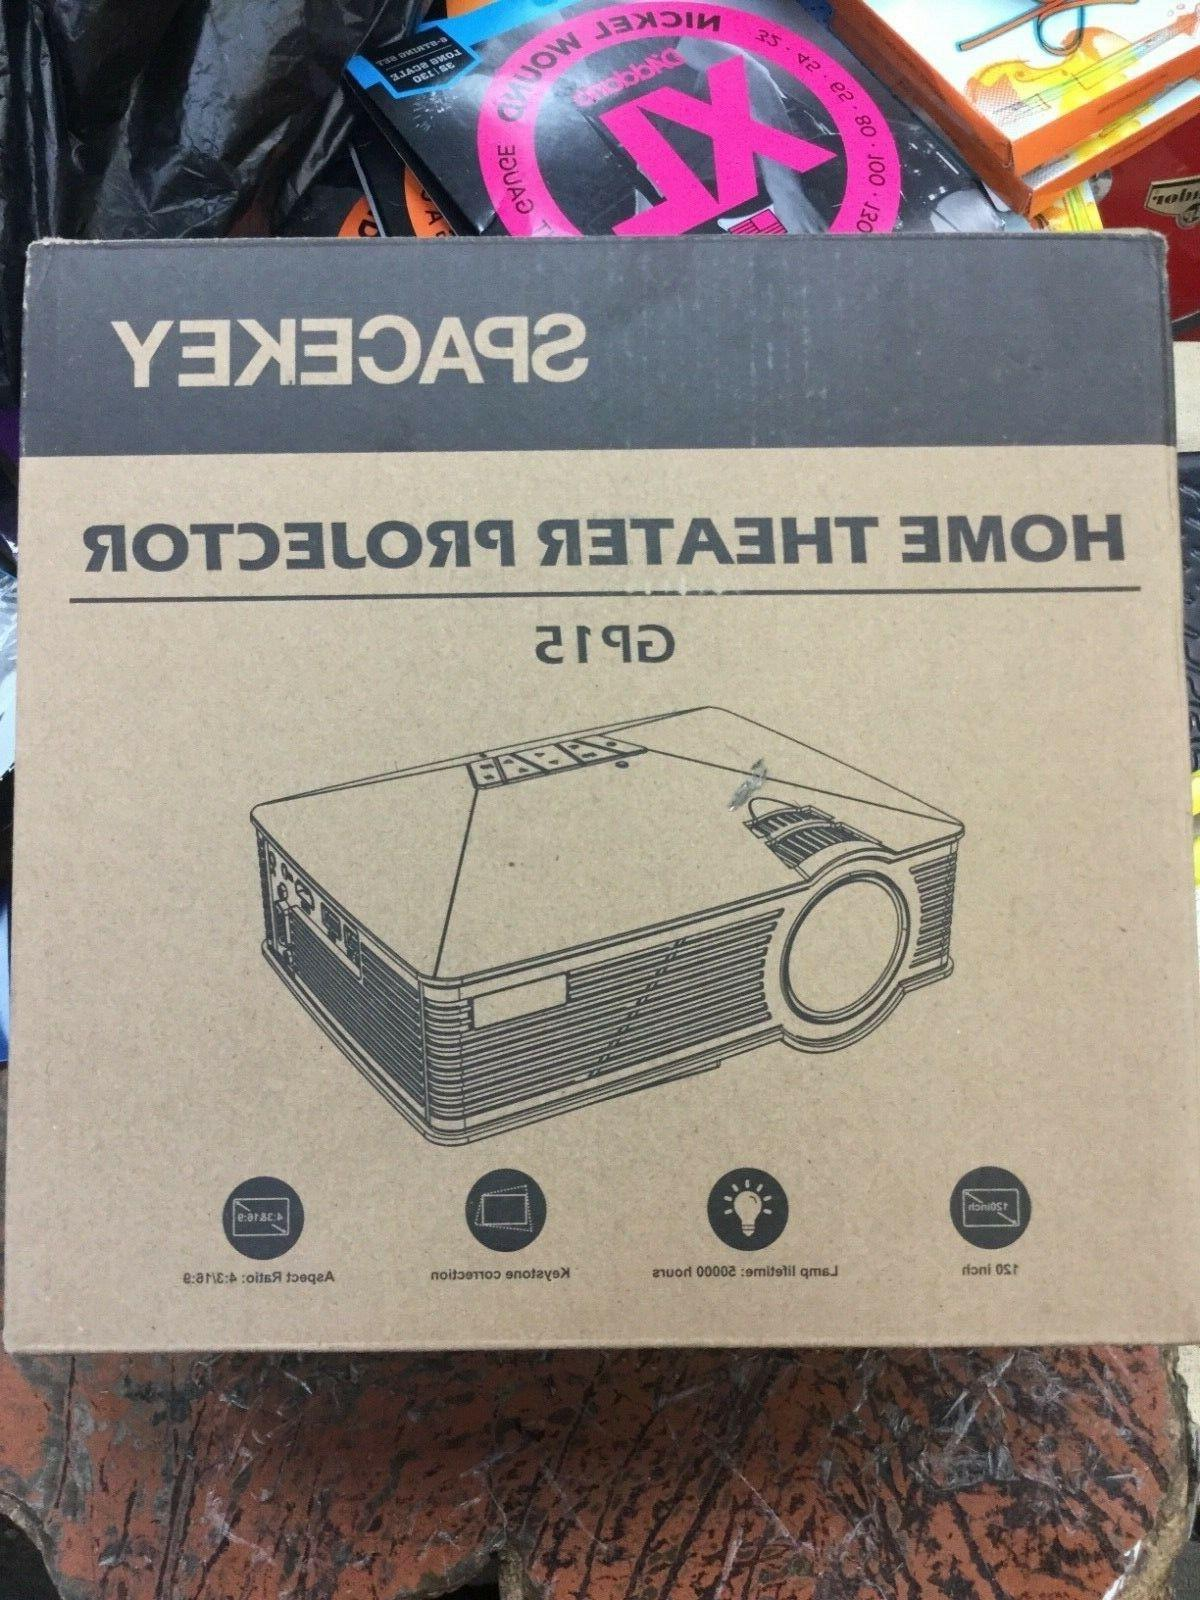 spacekey gp15 mini portable multimedia home theater